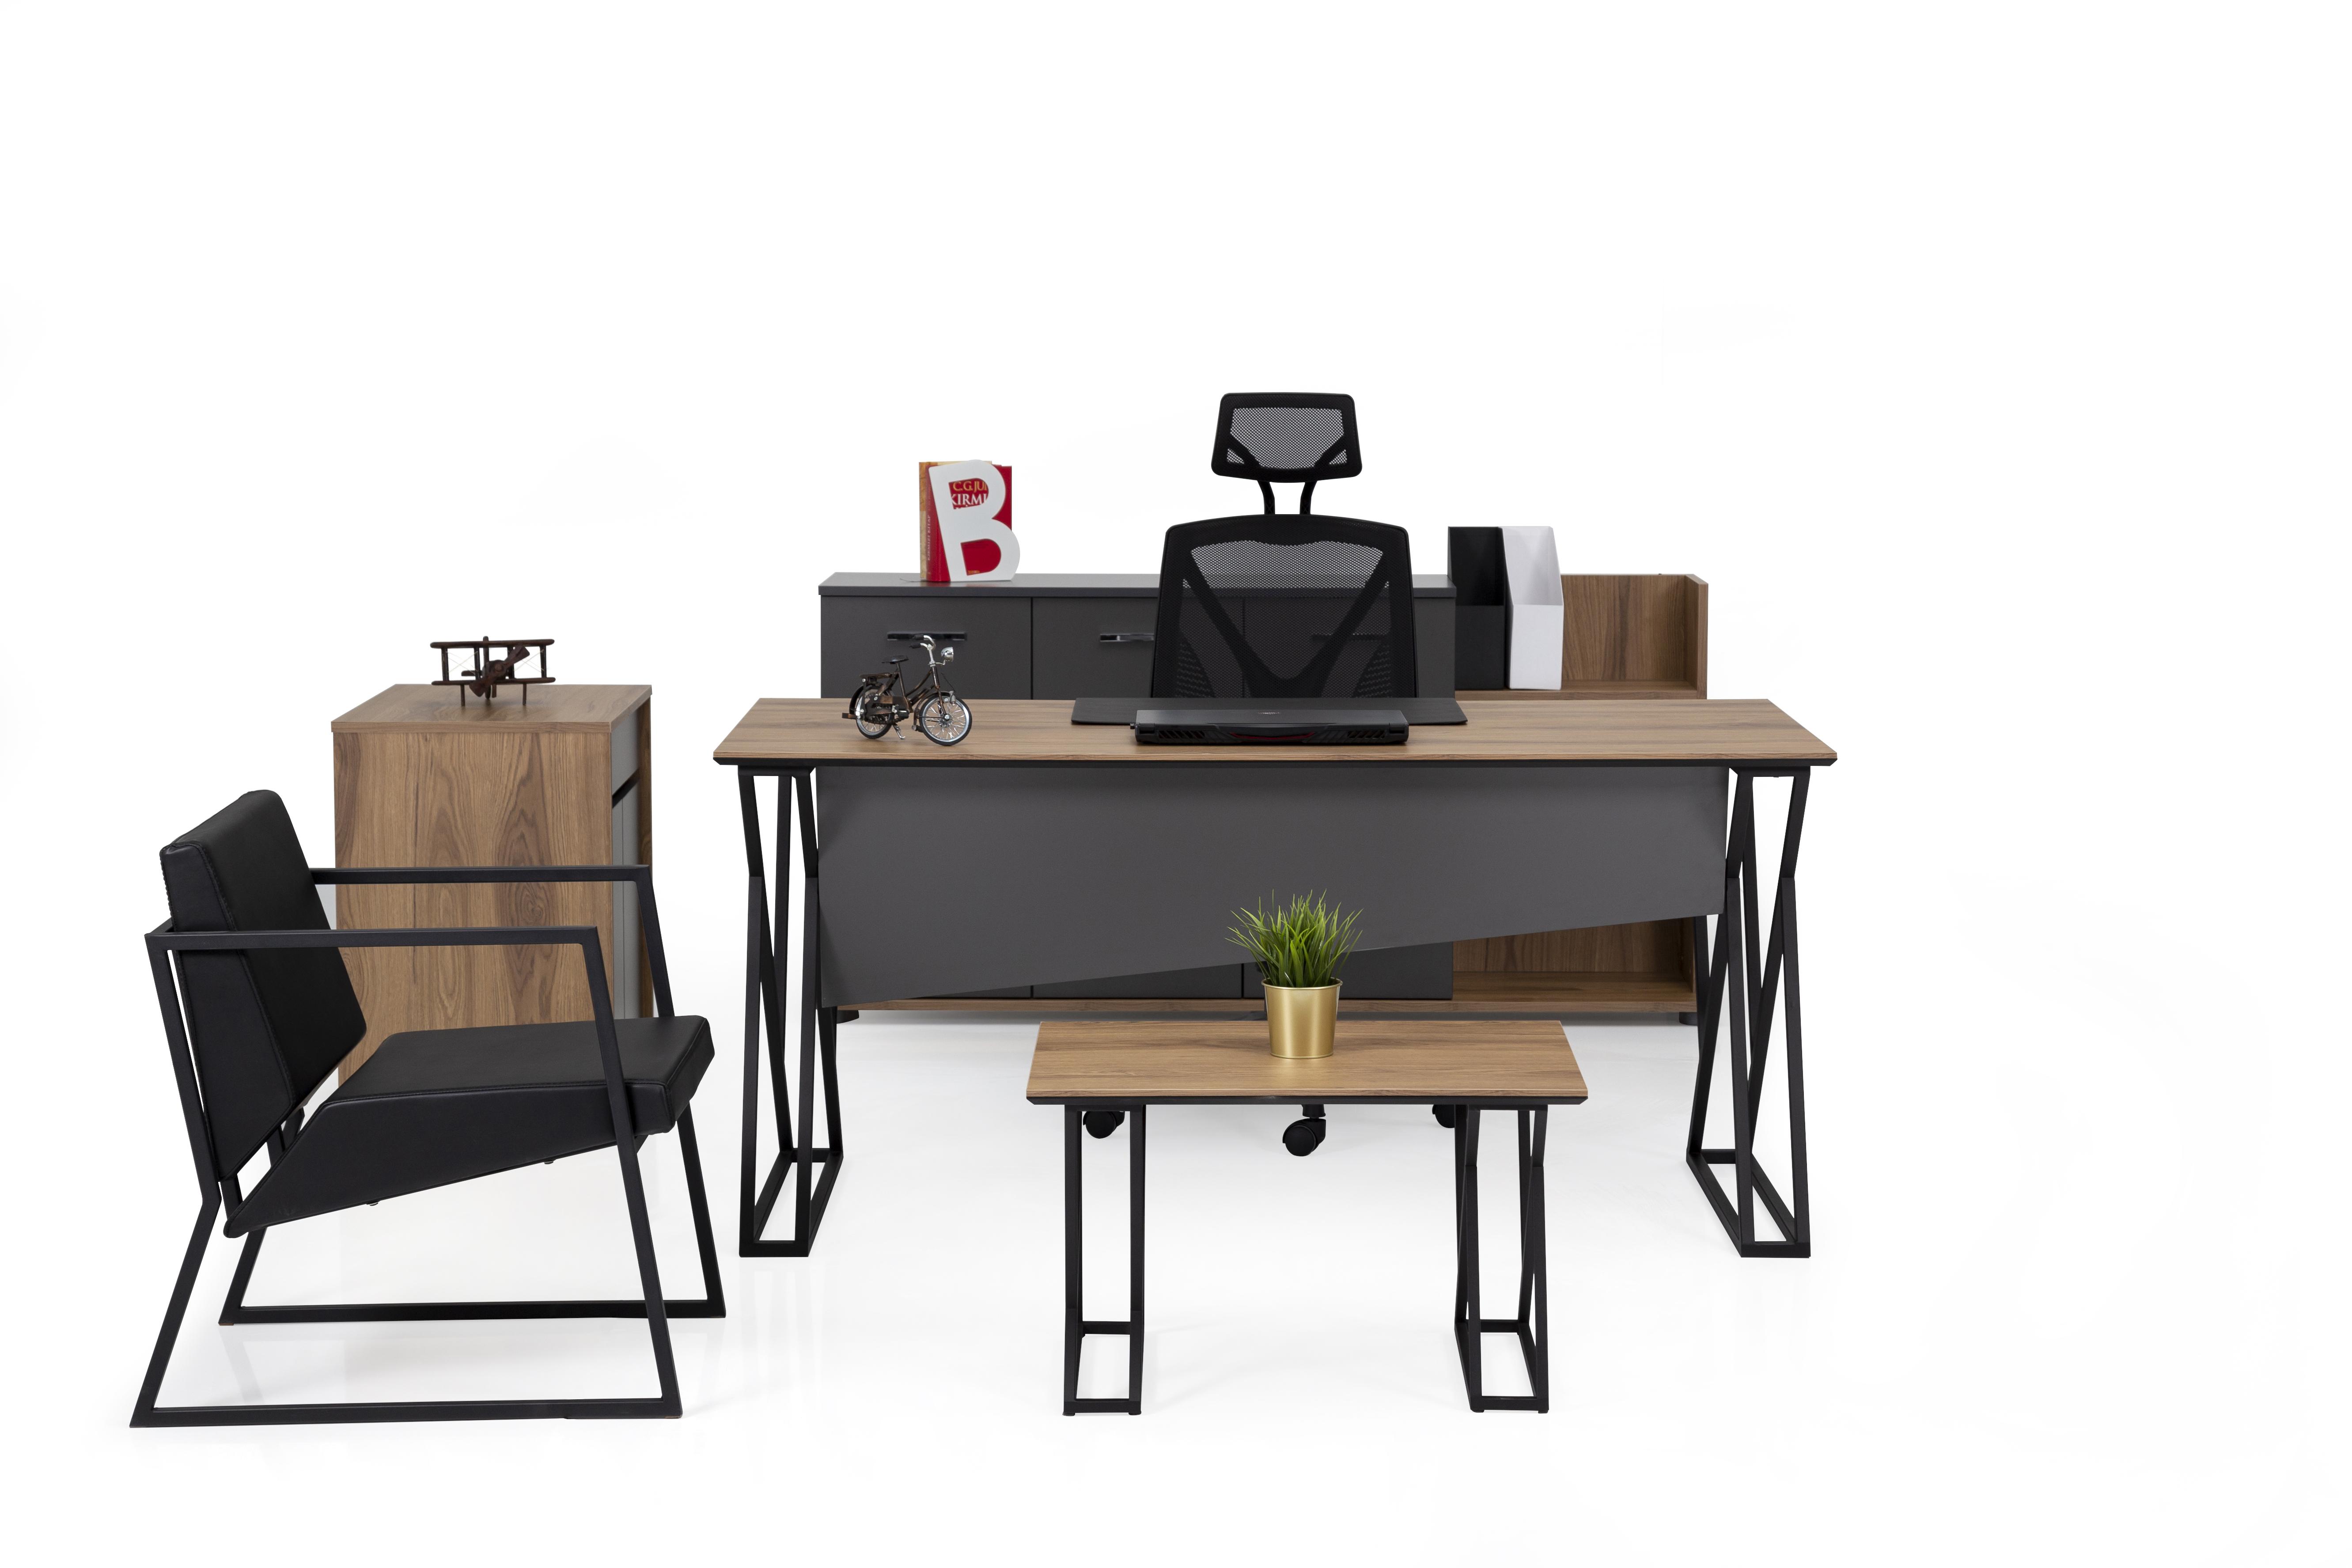 Ovali Büromöbel komplett 4-teilig Buton 160x80 cm